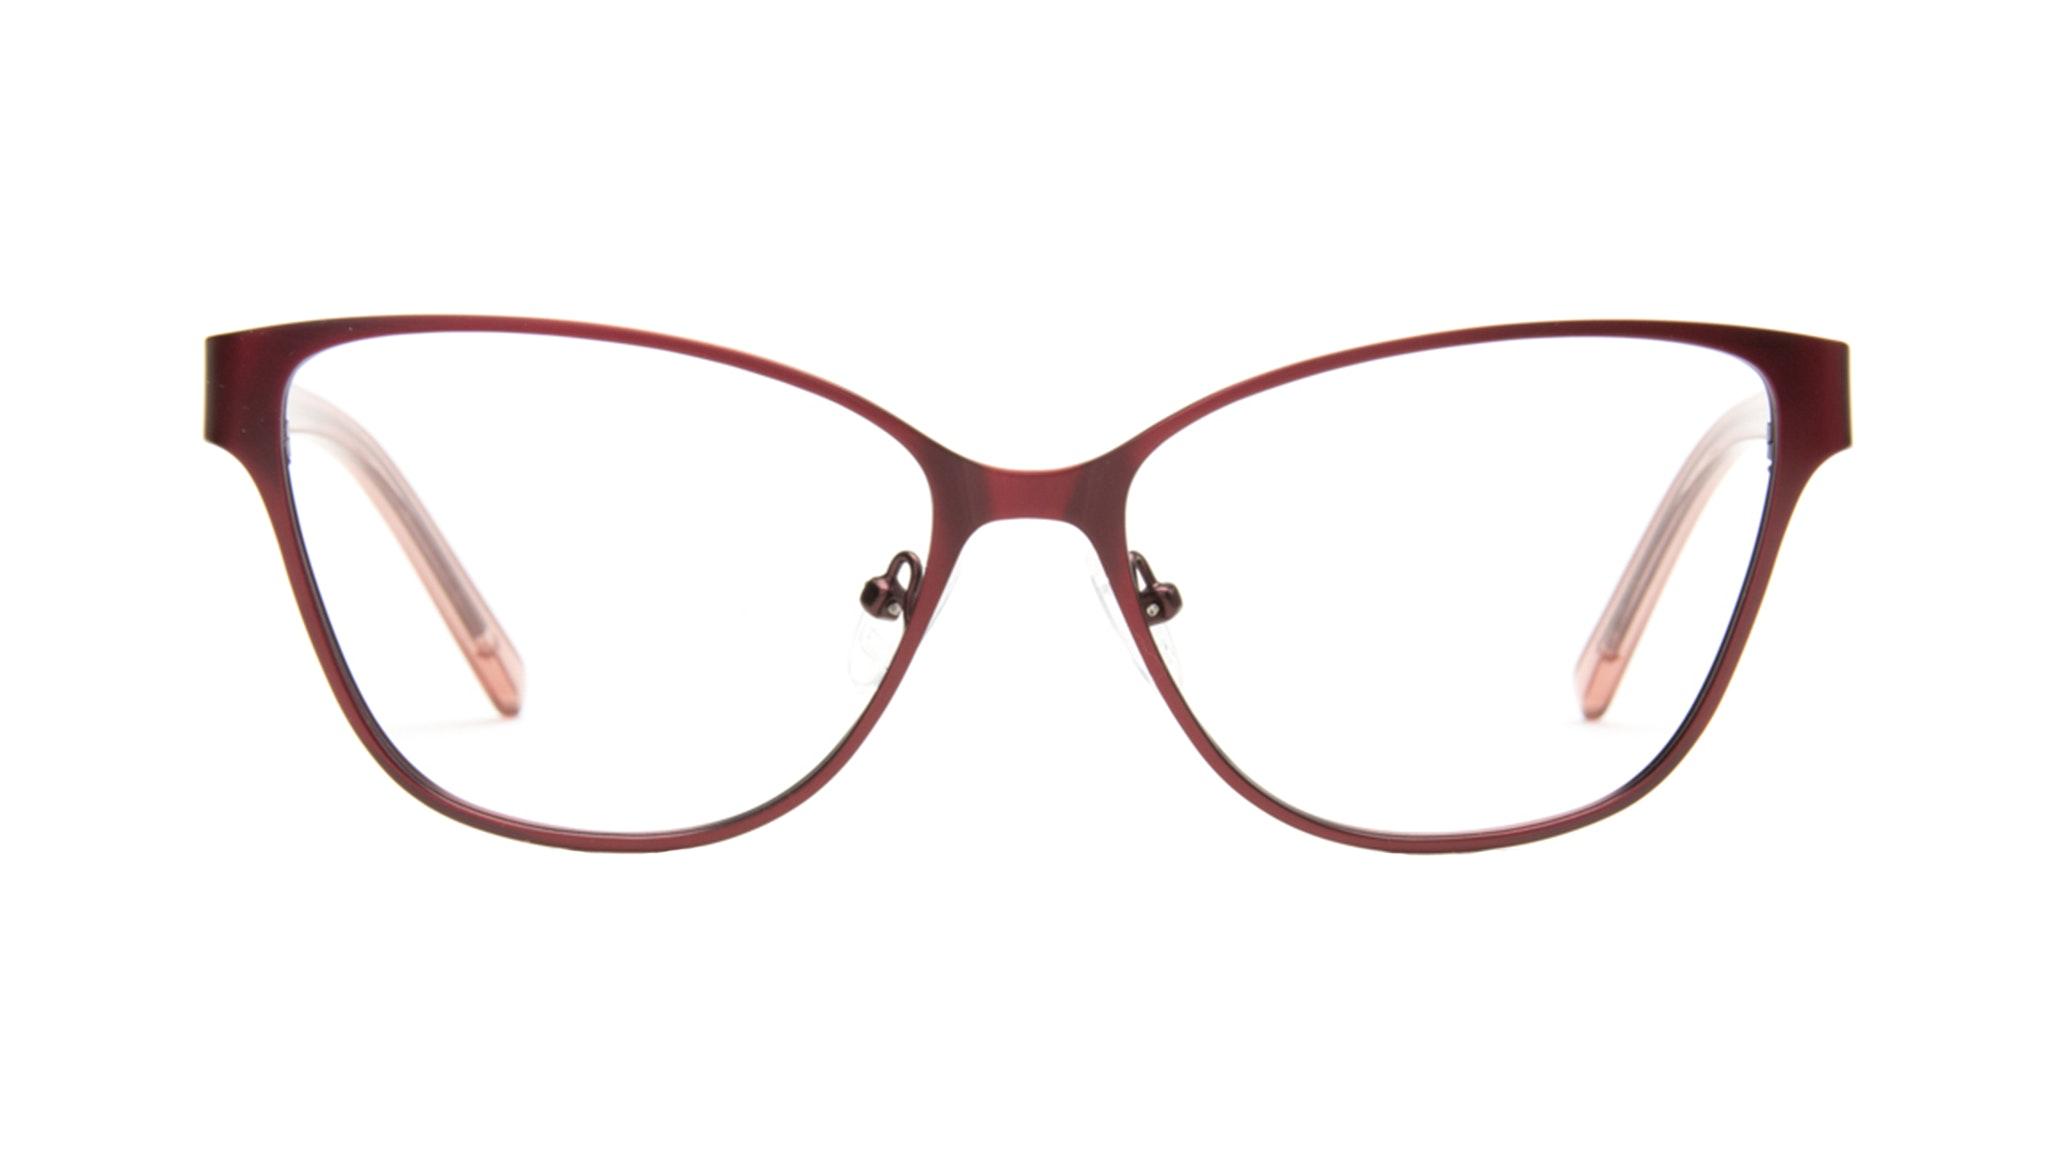 Affordable Fashion Glasses Cat Eye Rectangle Eyeglasses Women Radiant Cranberry